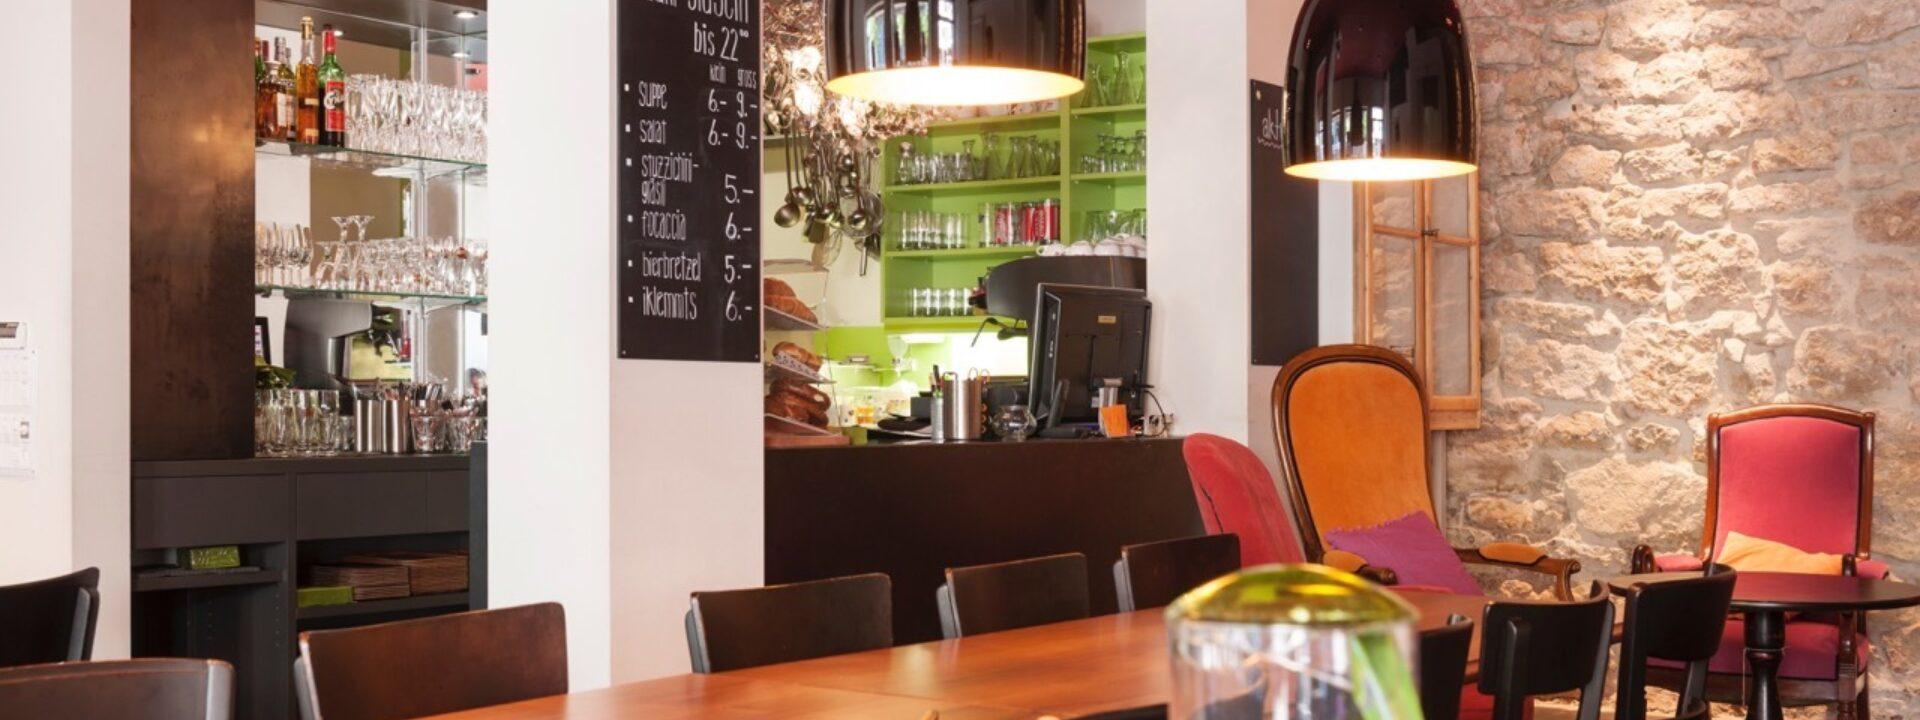 Restaurant mooi